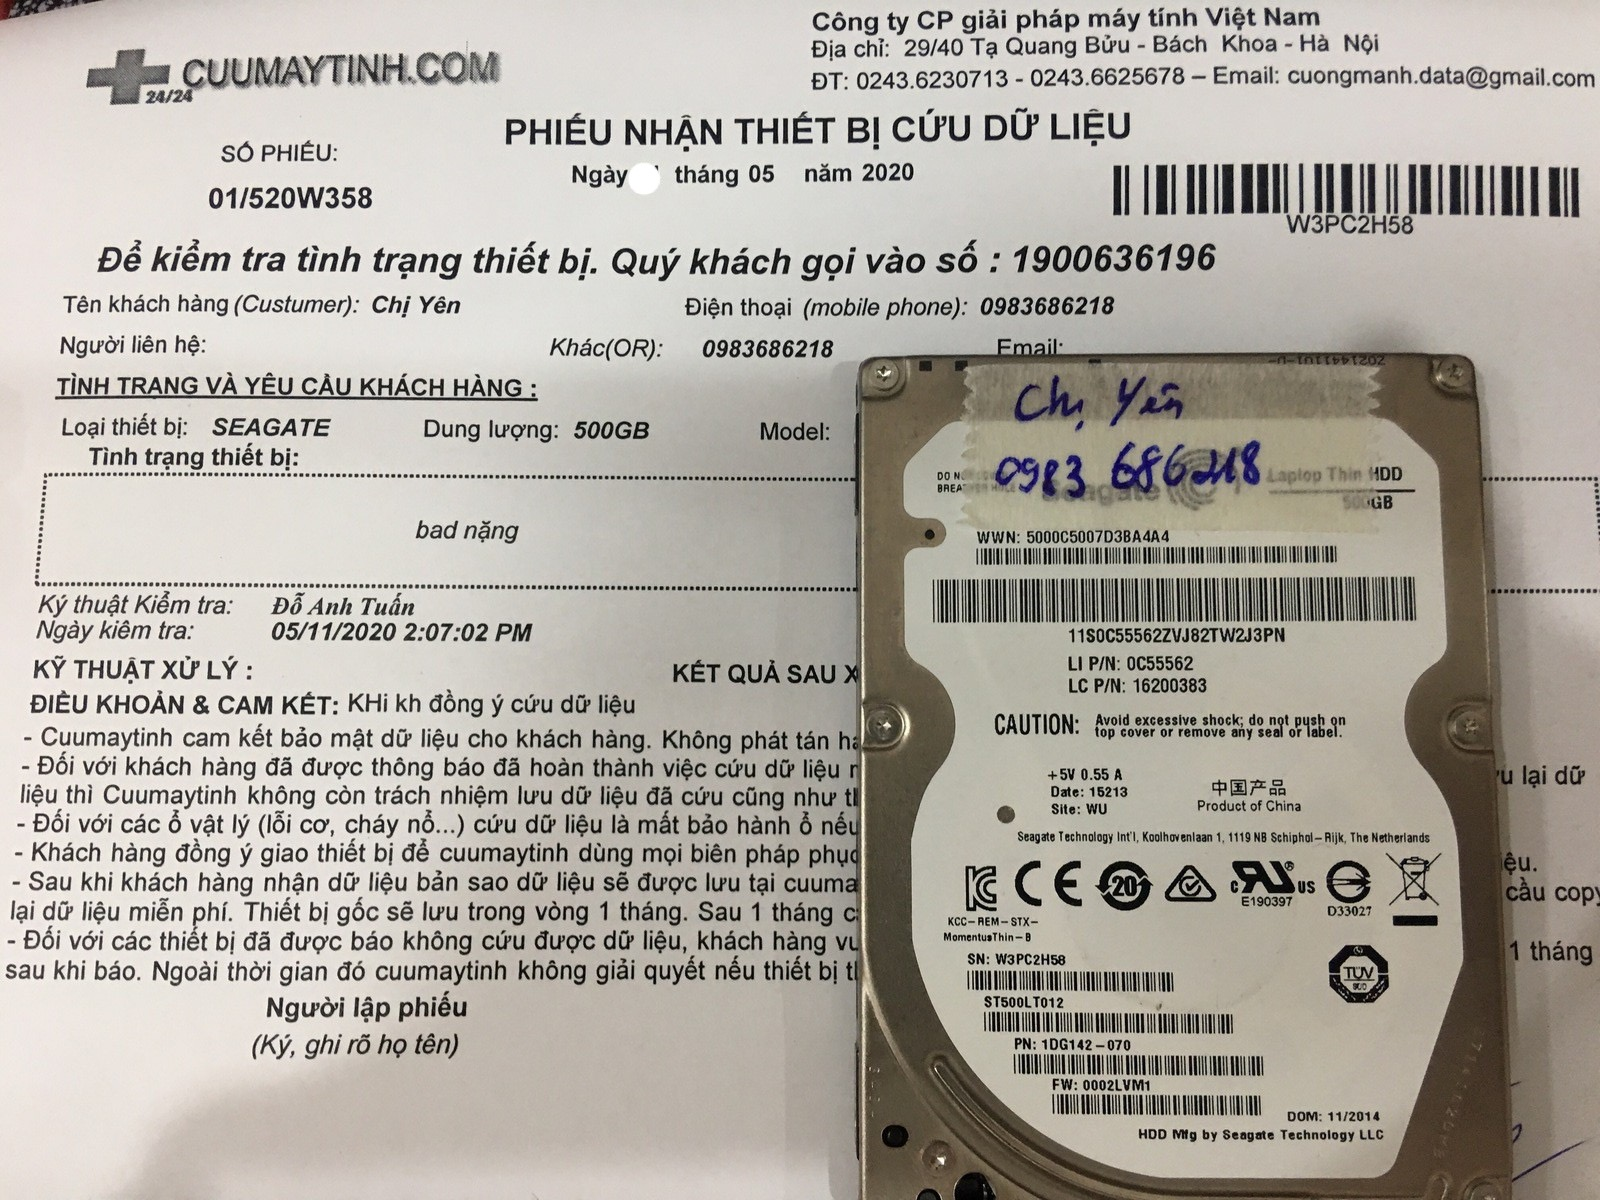 Cứu dữ liệu ổ cứng Seagate 500GB bad 13/05/2020 - cuumaytinh